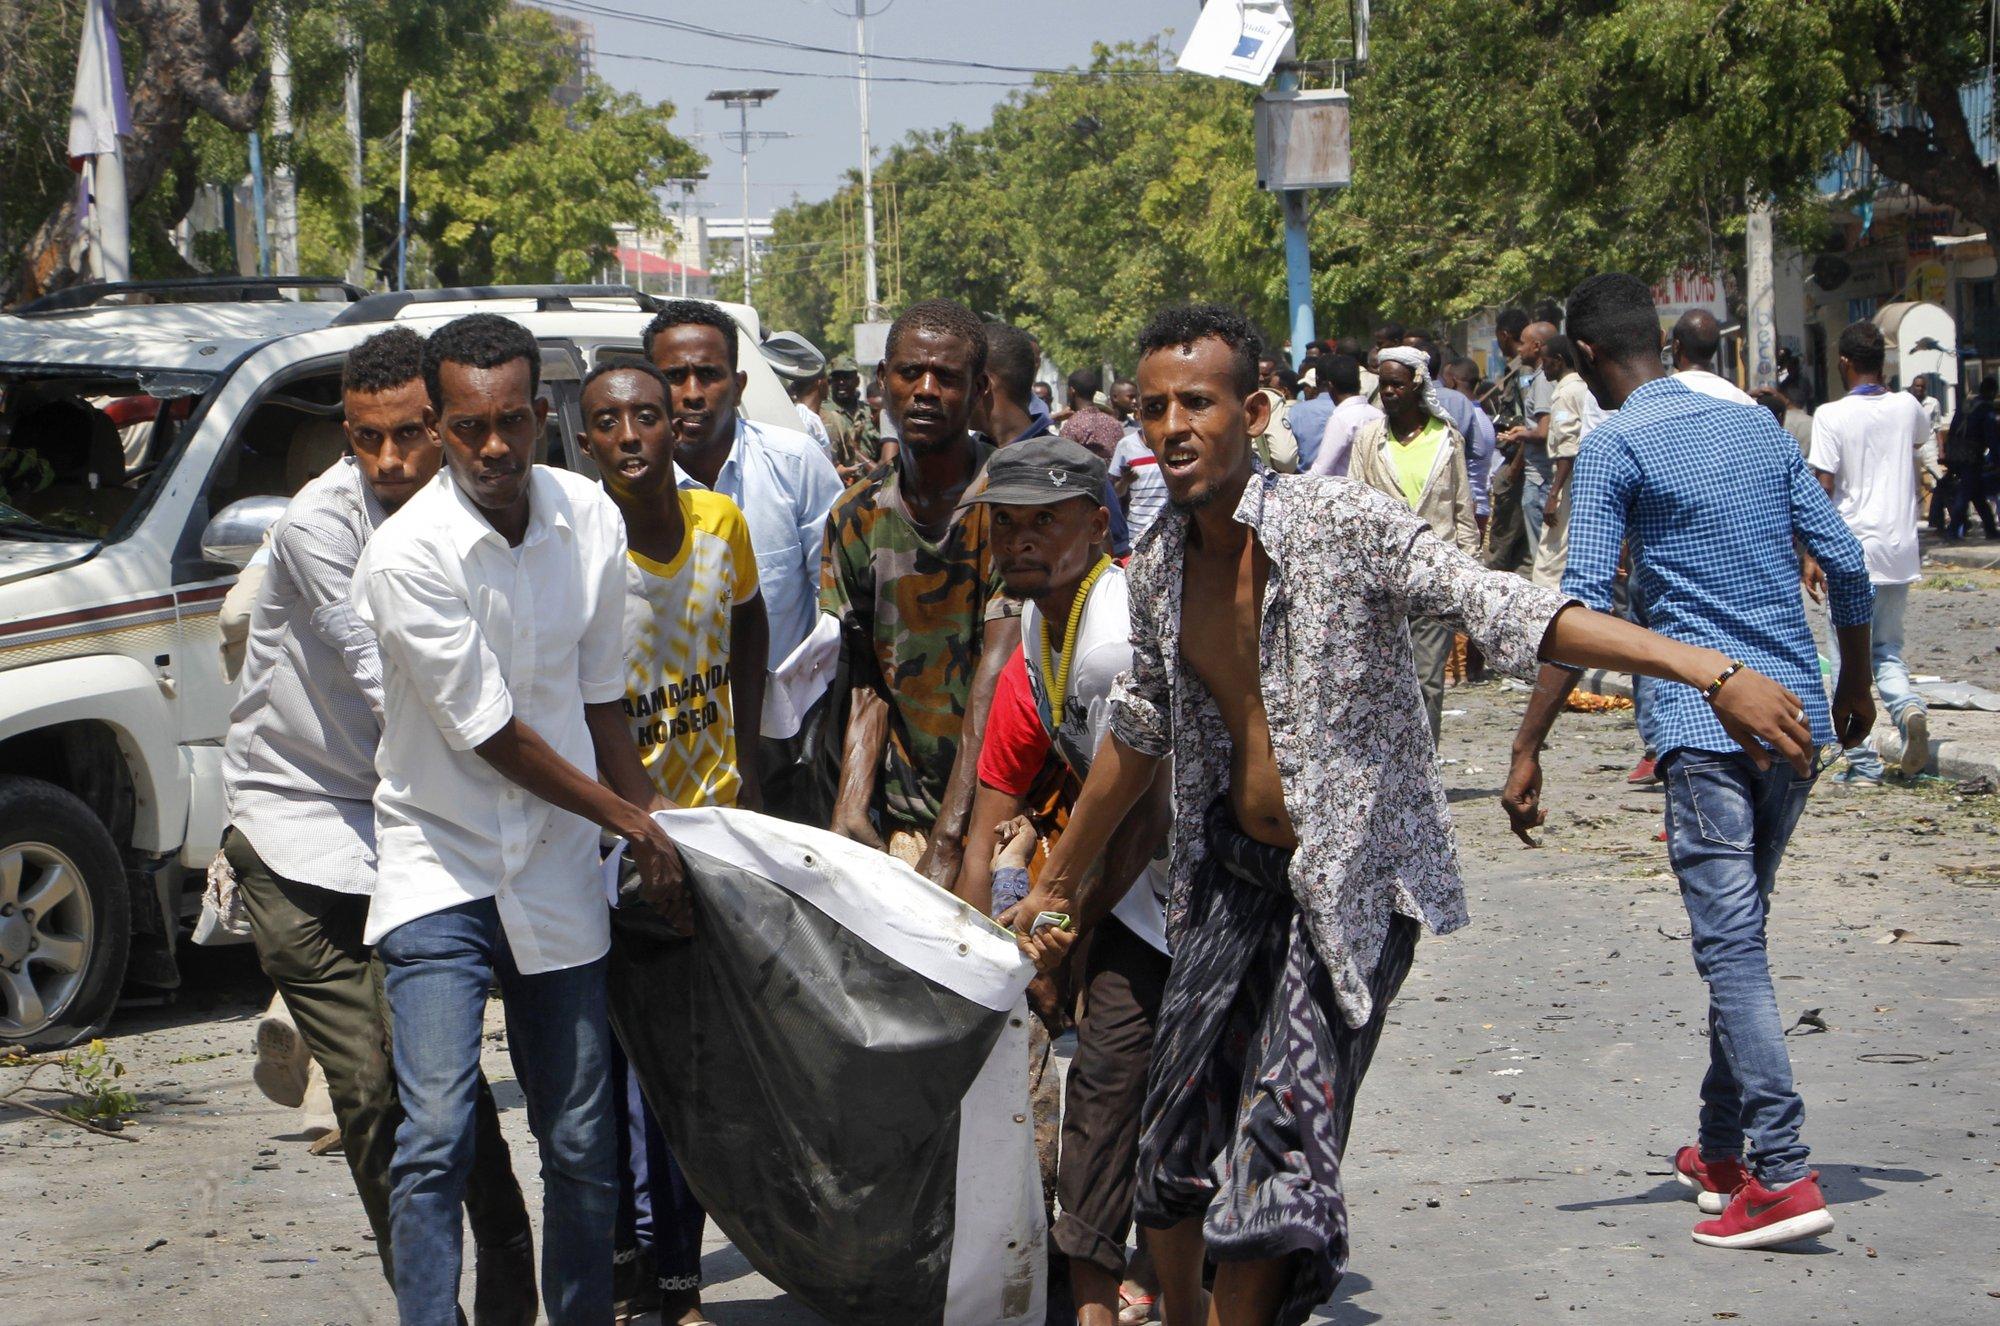 16 dead after blast outside restaurant in Somalia's capital